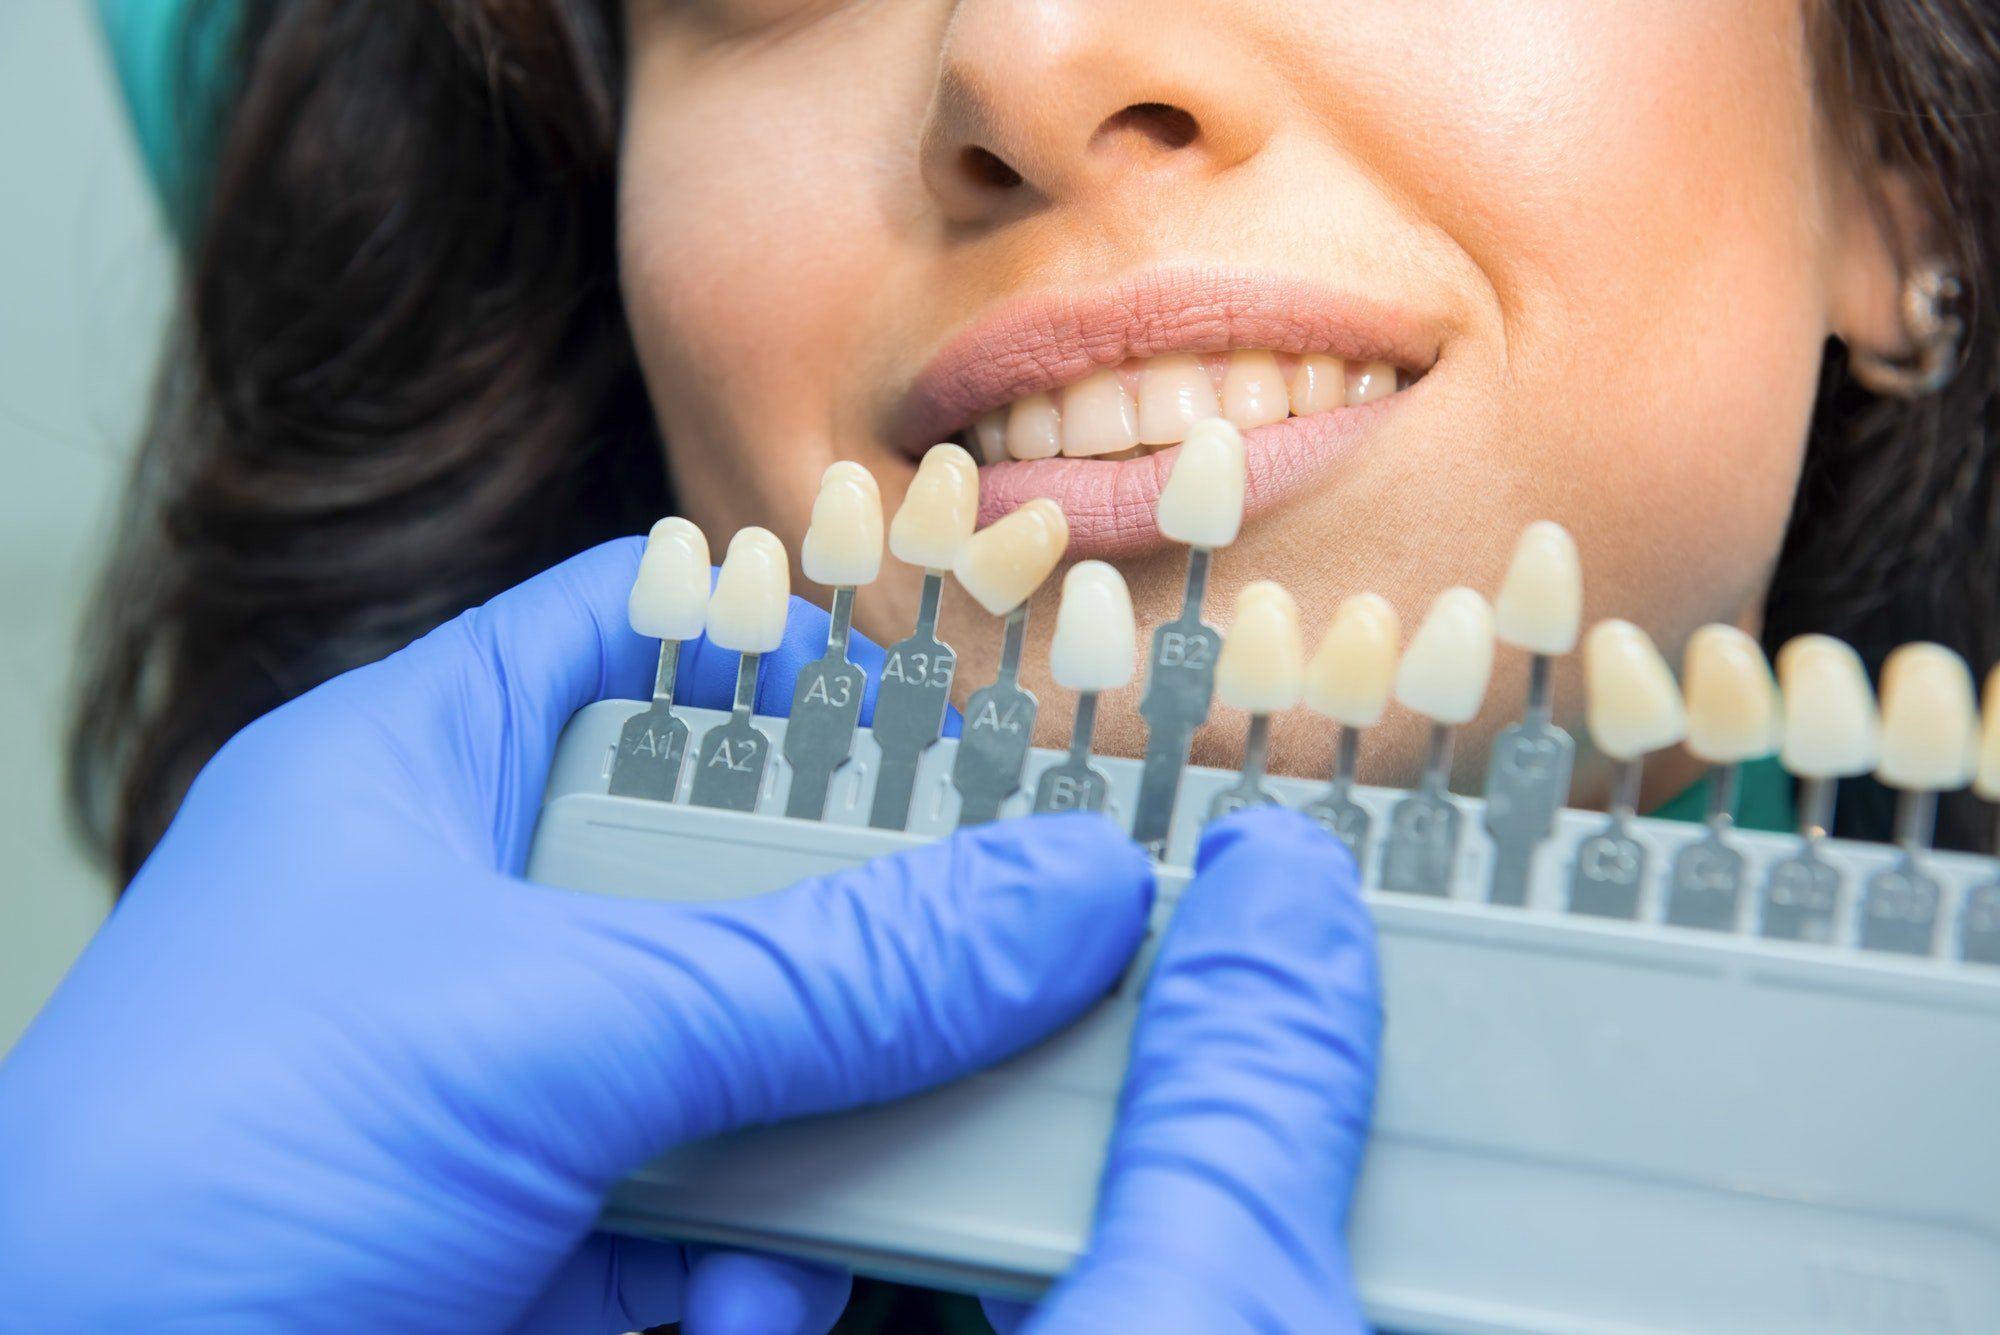 get professional teeth whitening near you